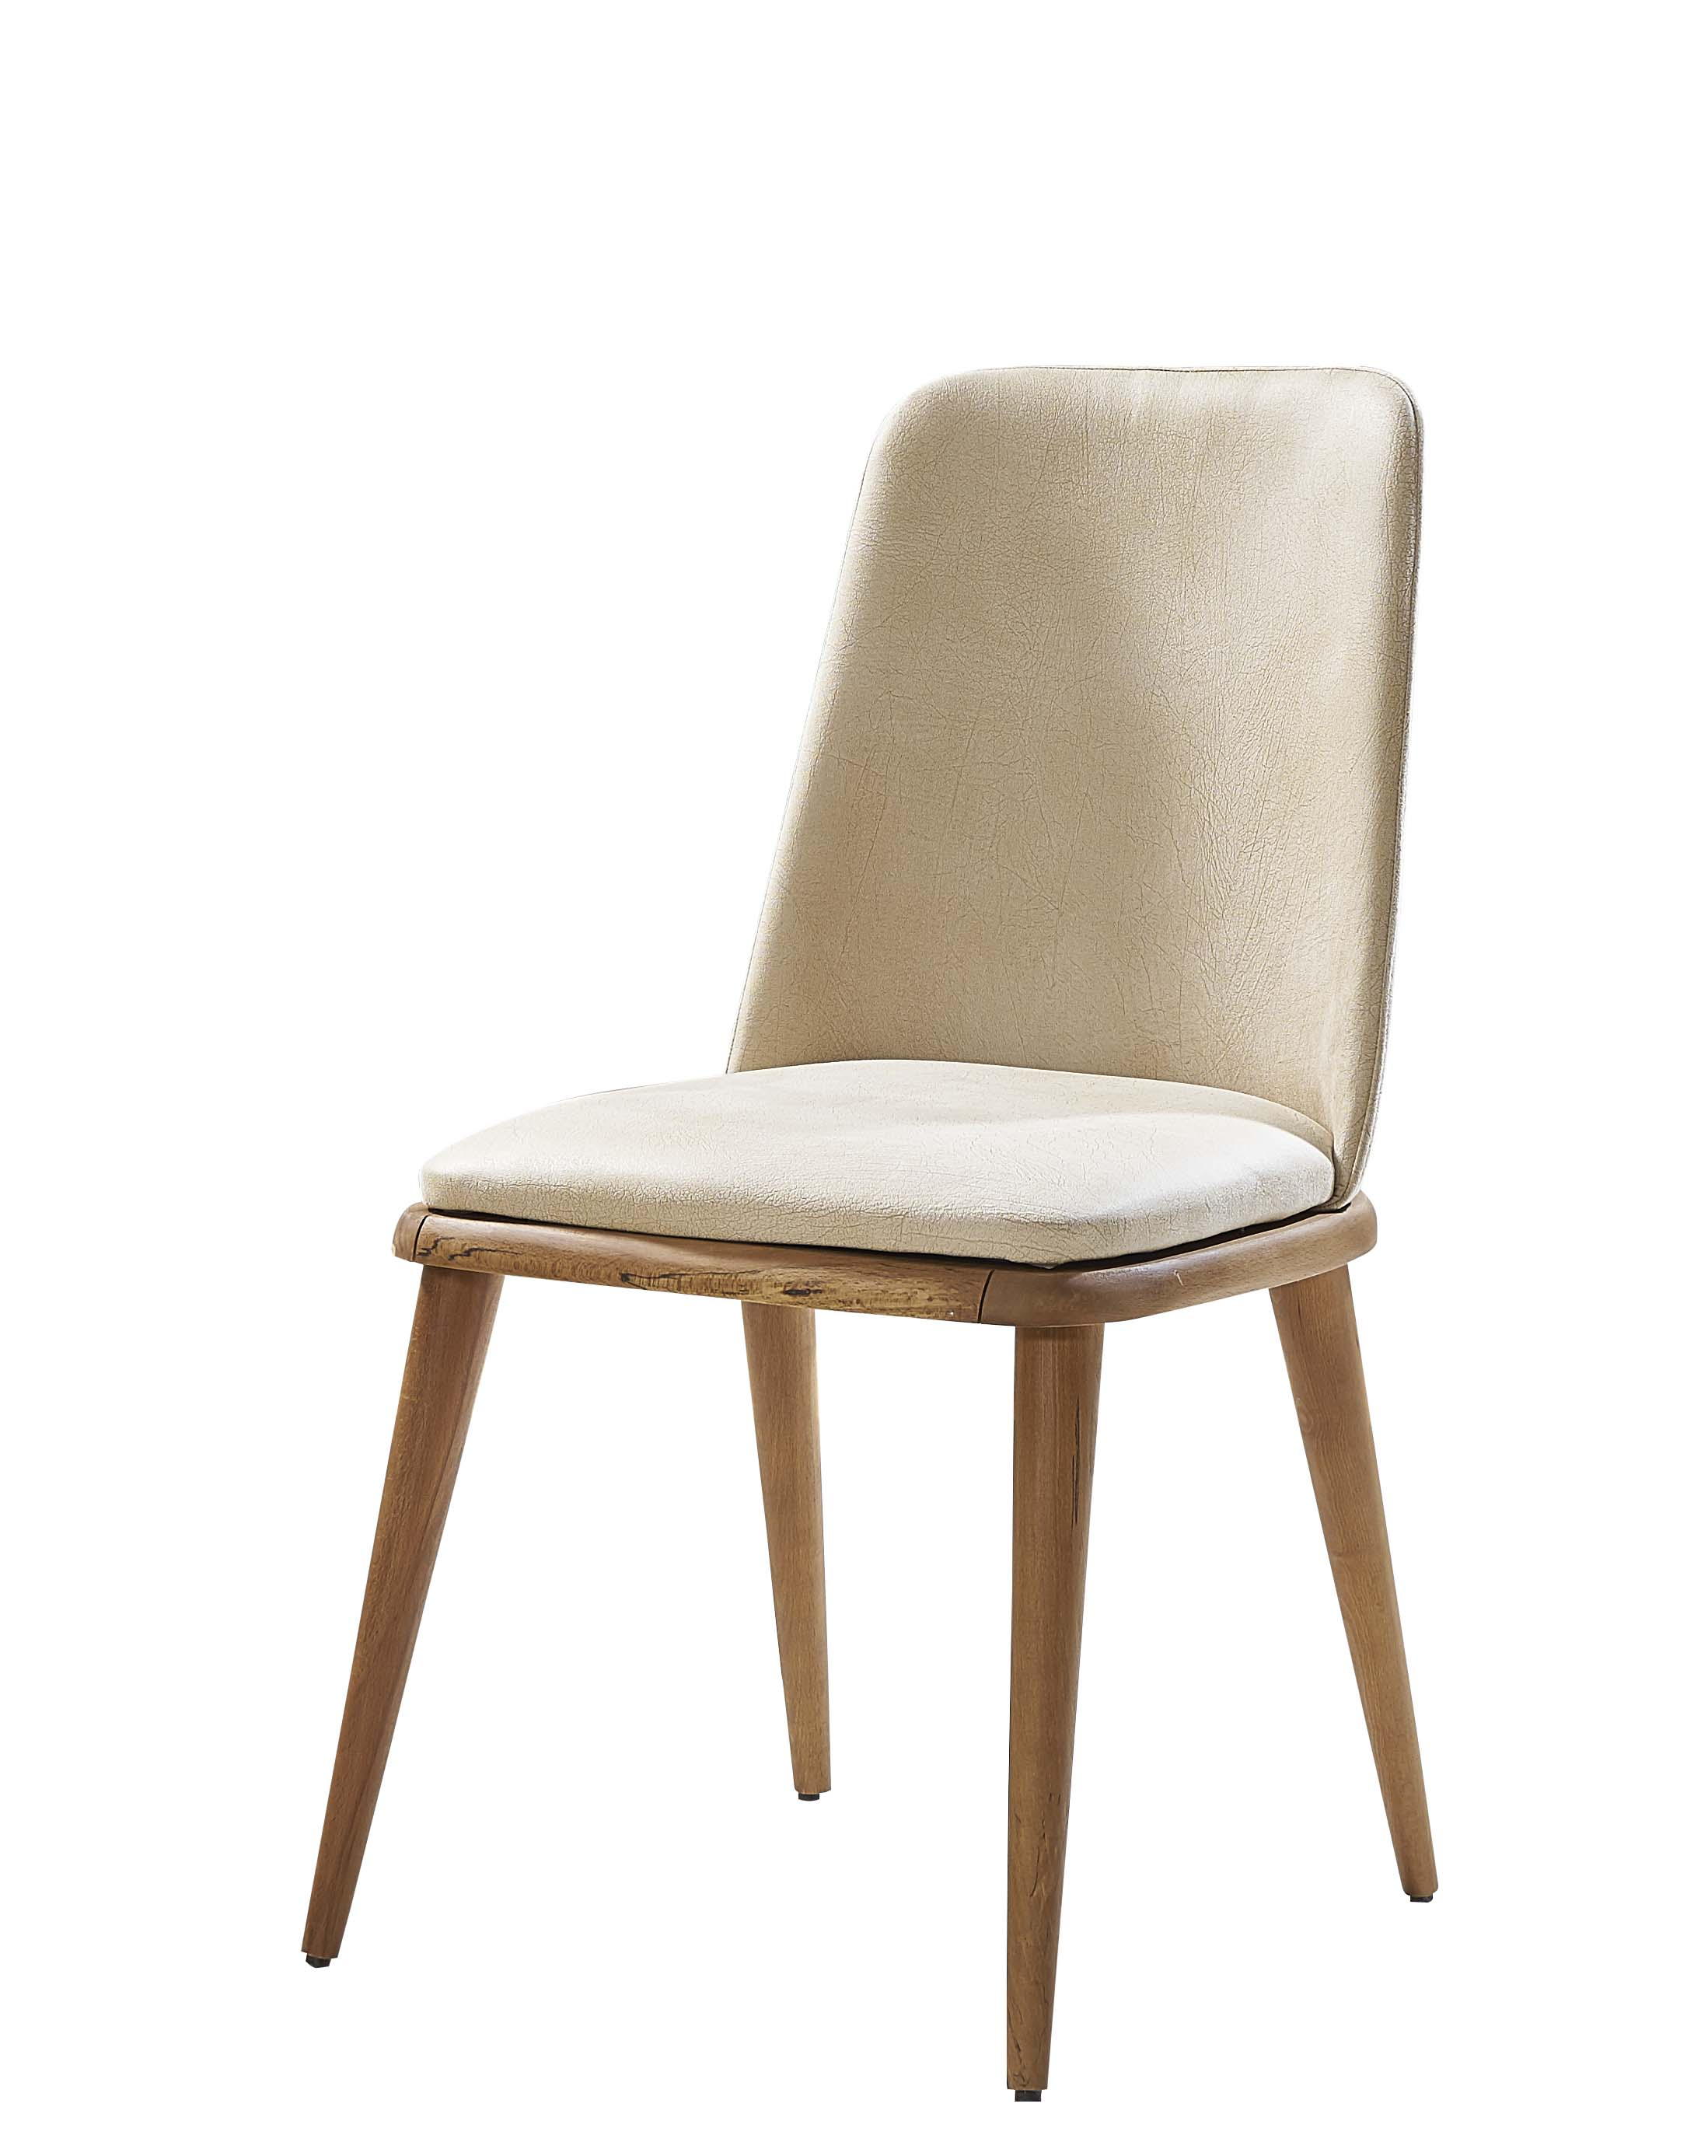 Lidya Esszimmer Stuhl Panama mit Massivholz Beinen